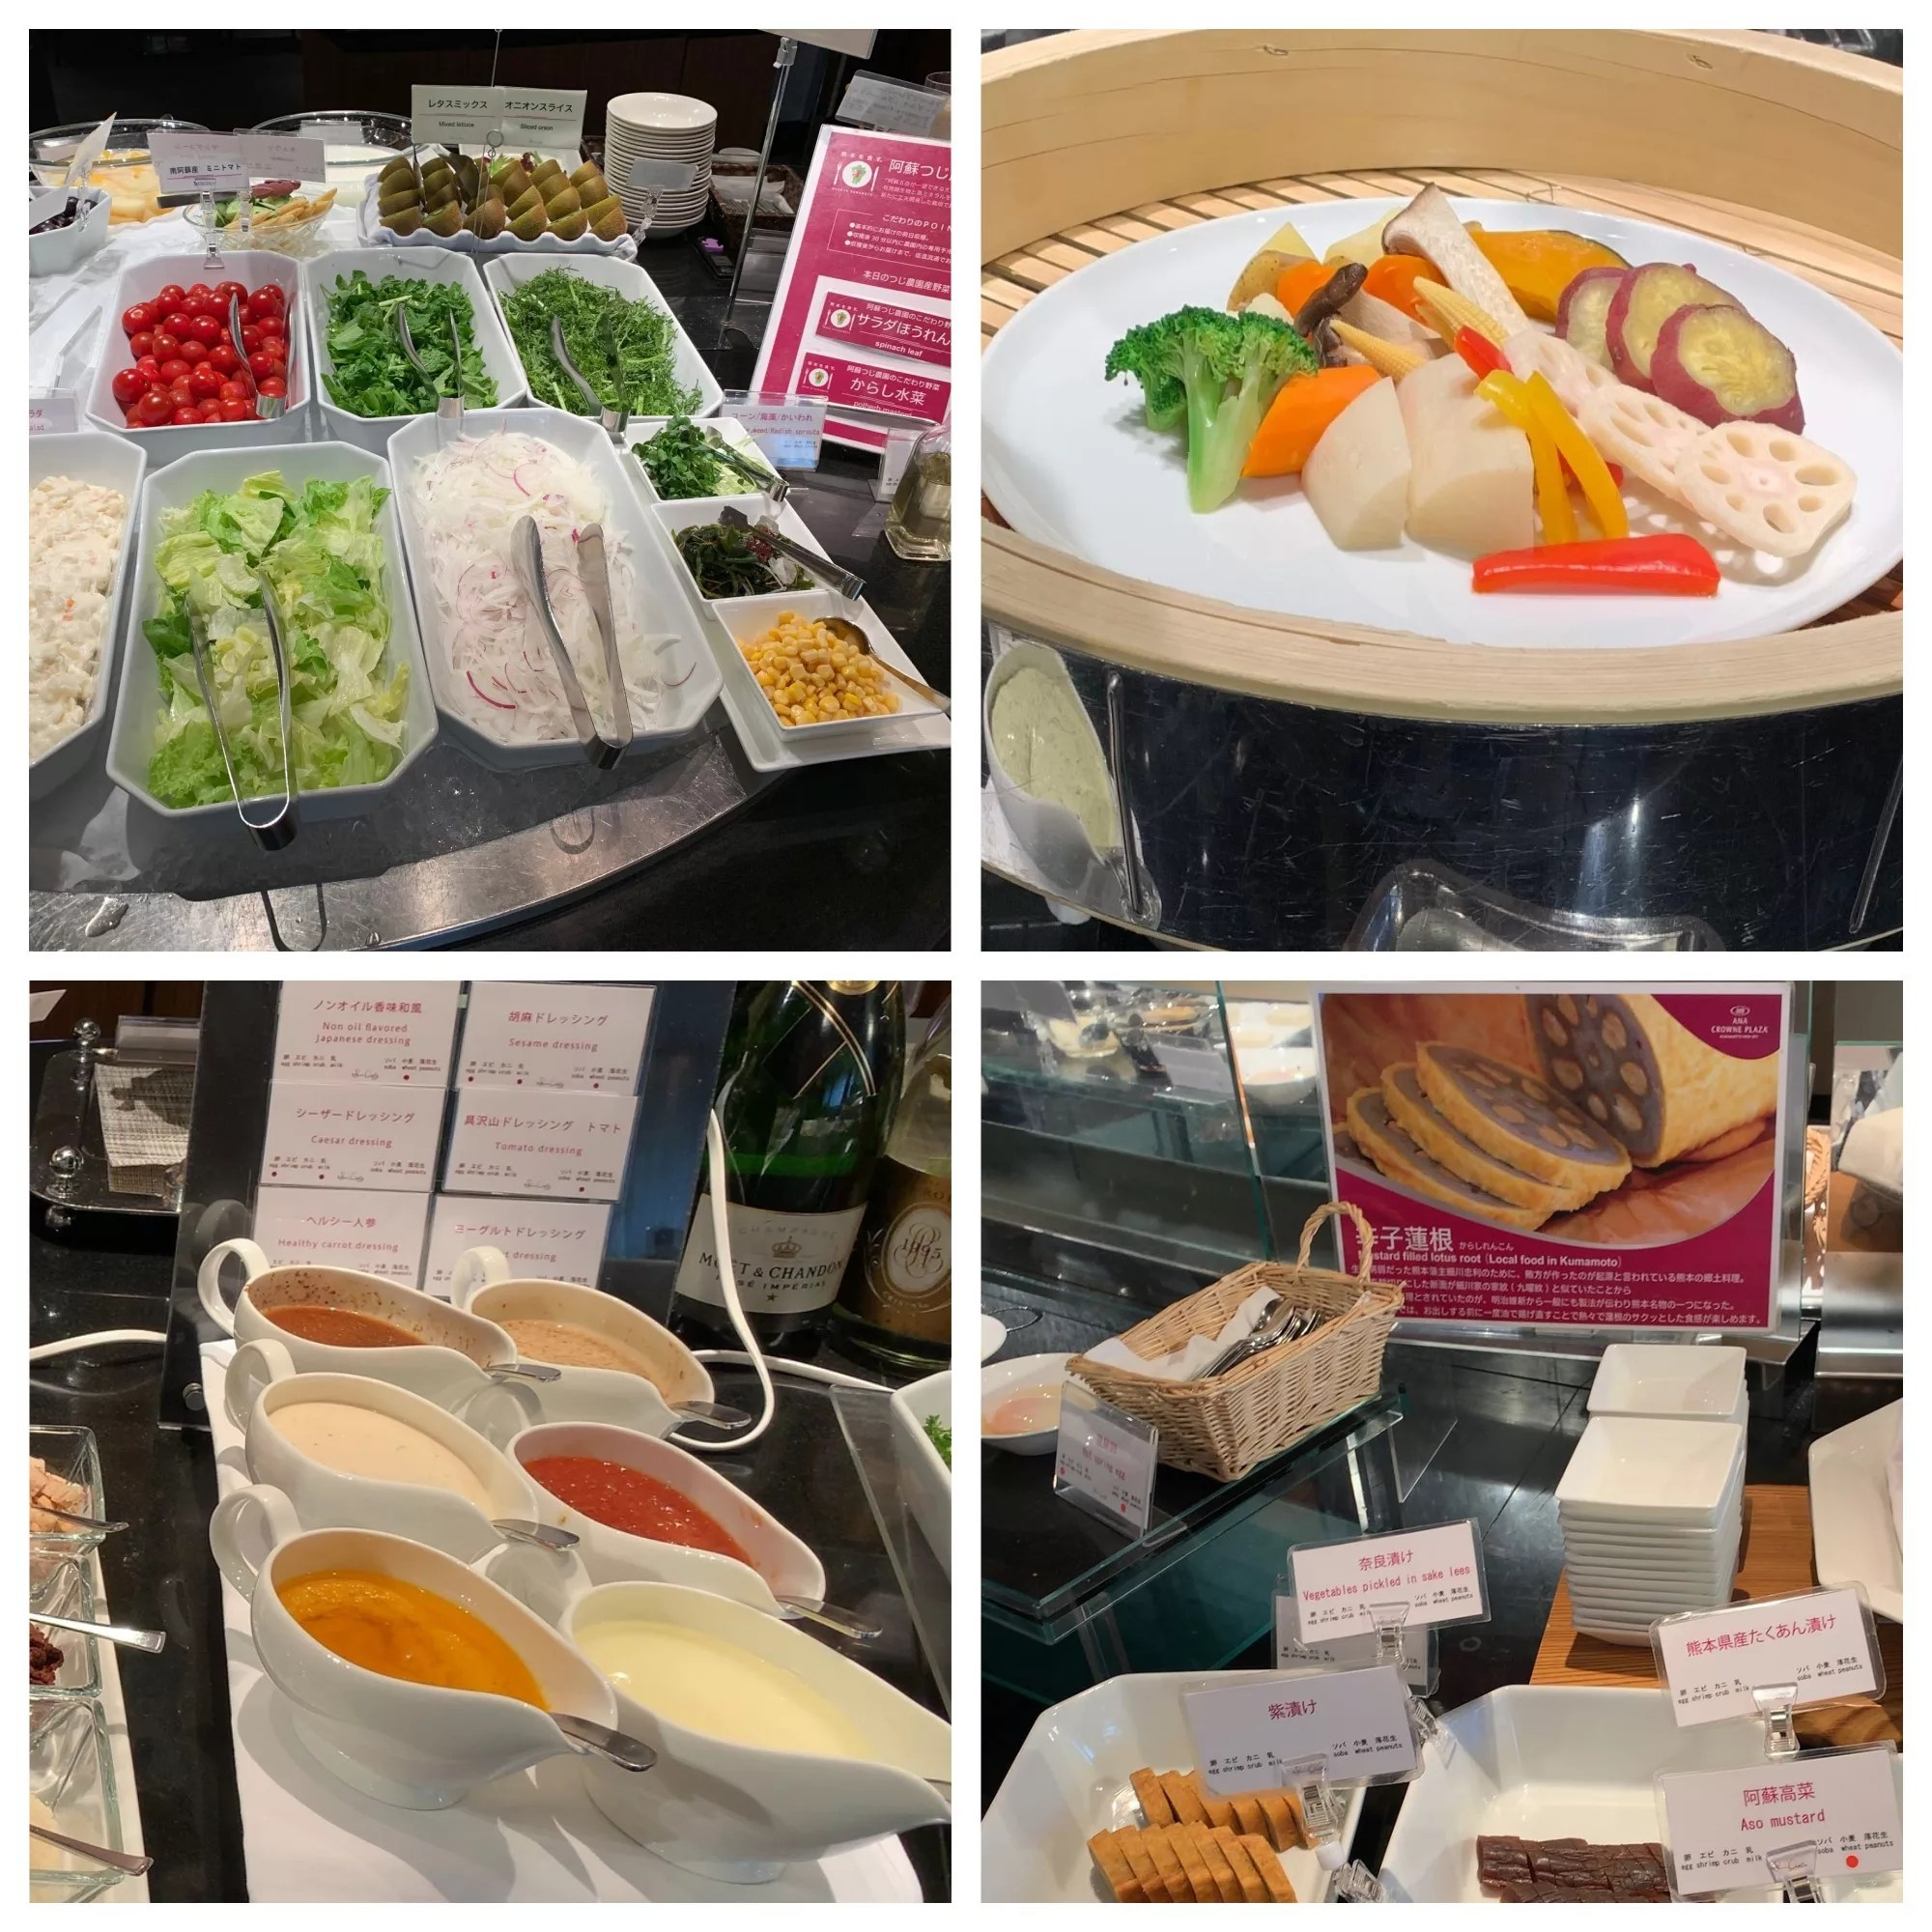 ANAクラウンプラザホテル熊本ニュースカイ サンシエロ 朝食ブッフェ全メニュー紹介